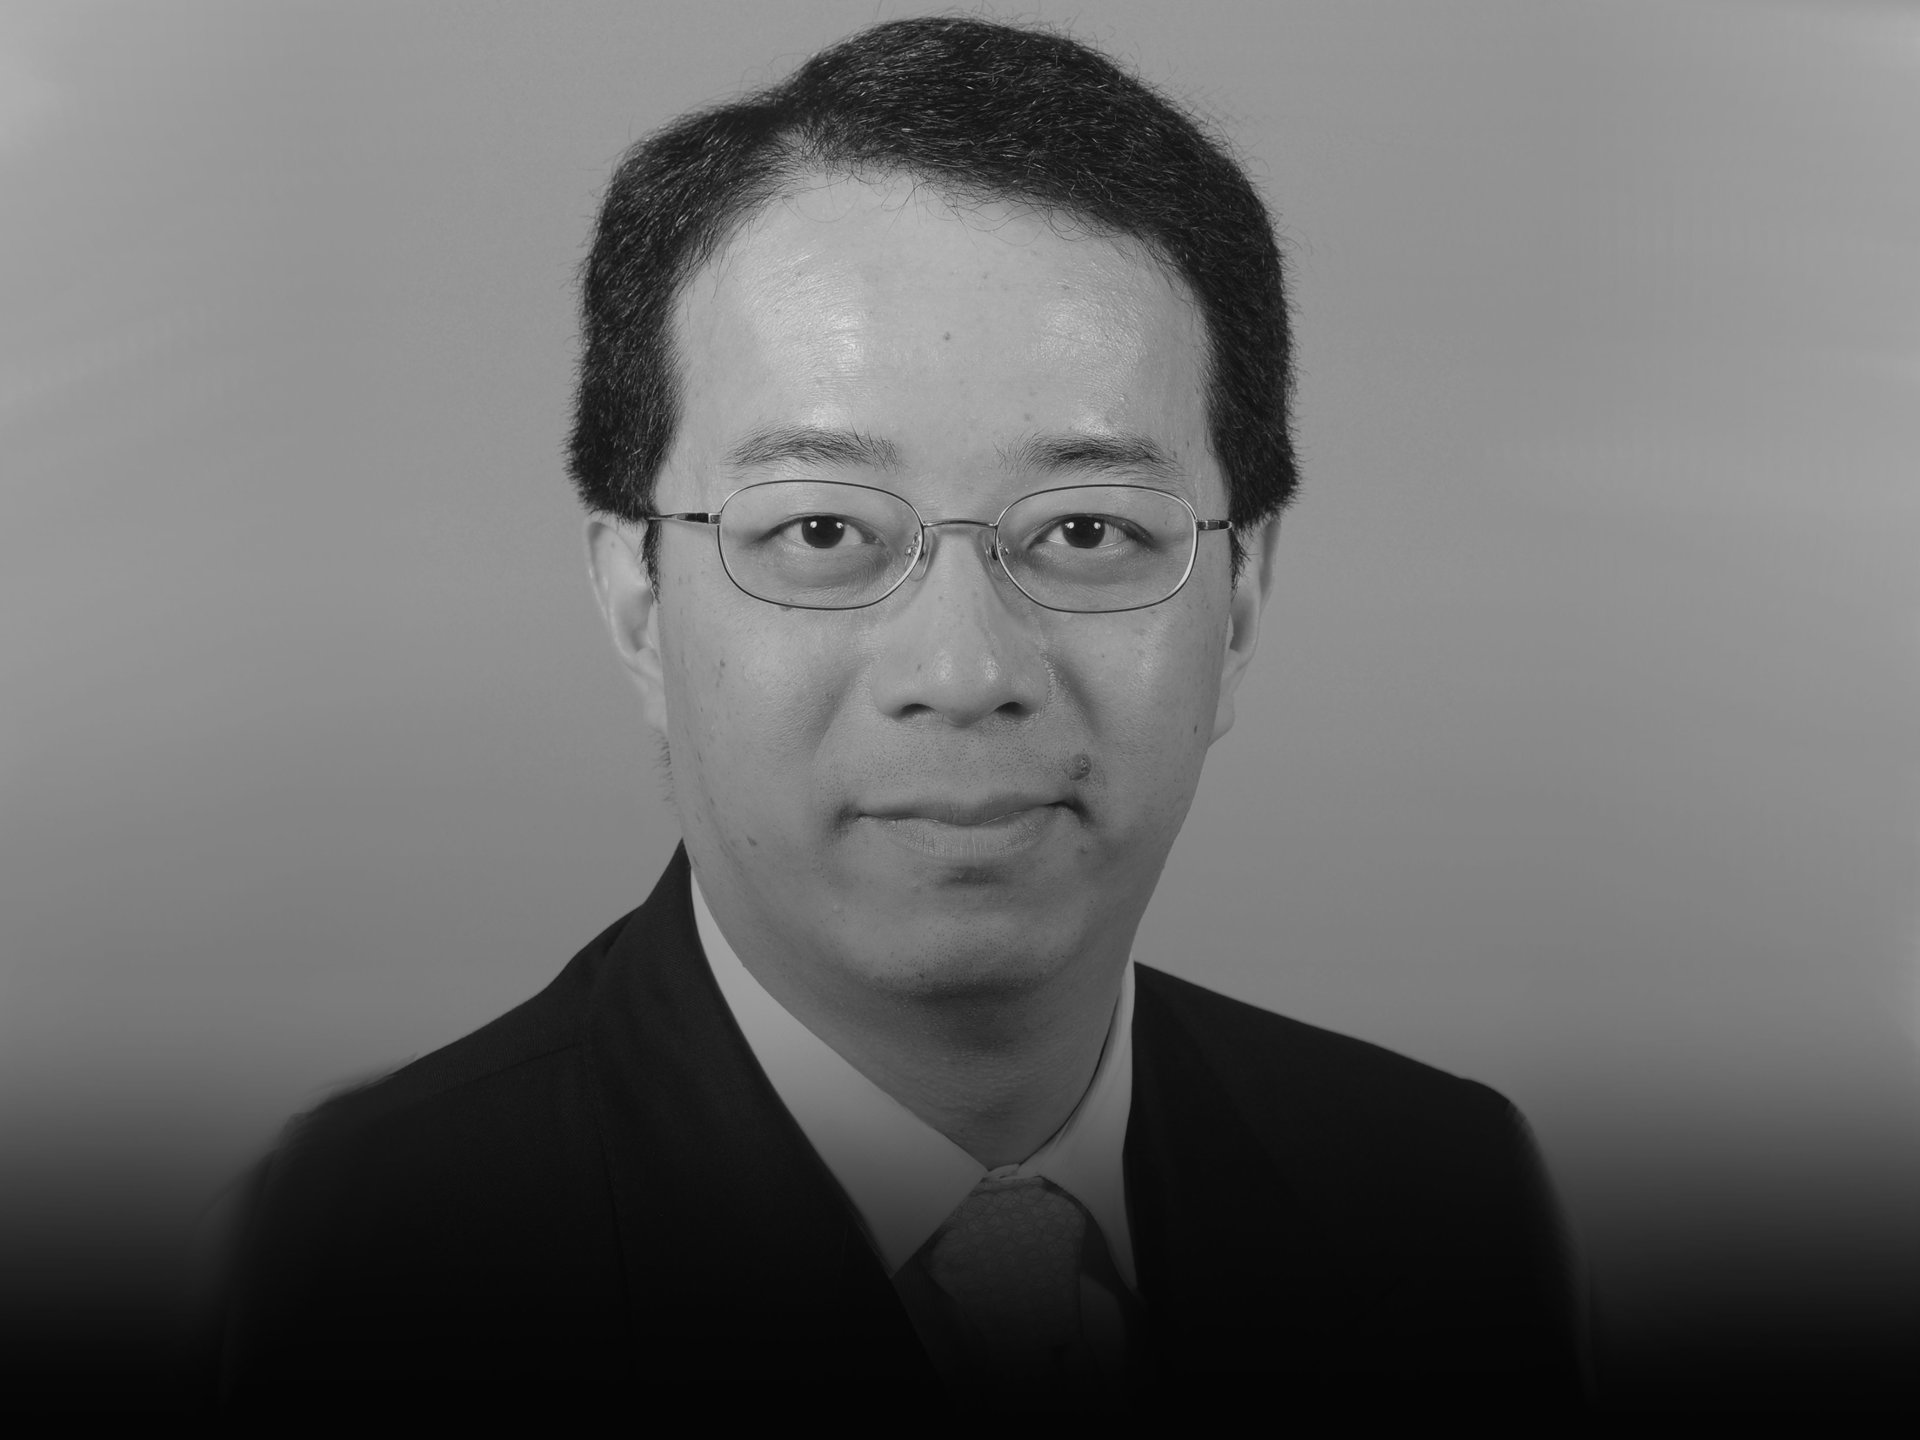 Image of Richard Tsang